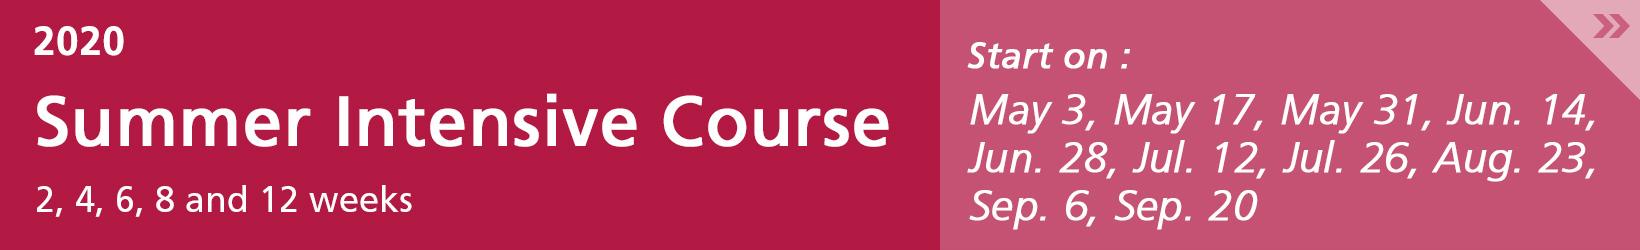 summer intensive course